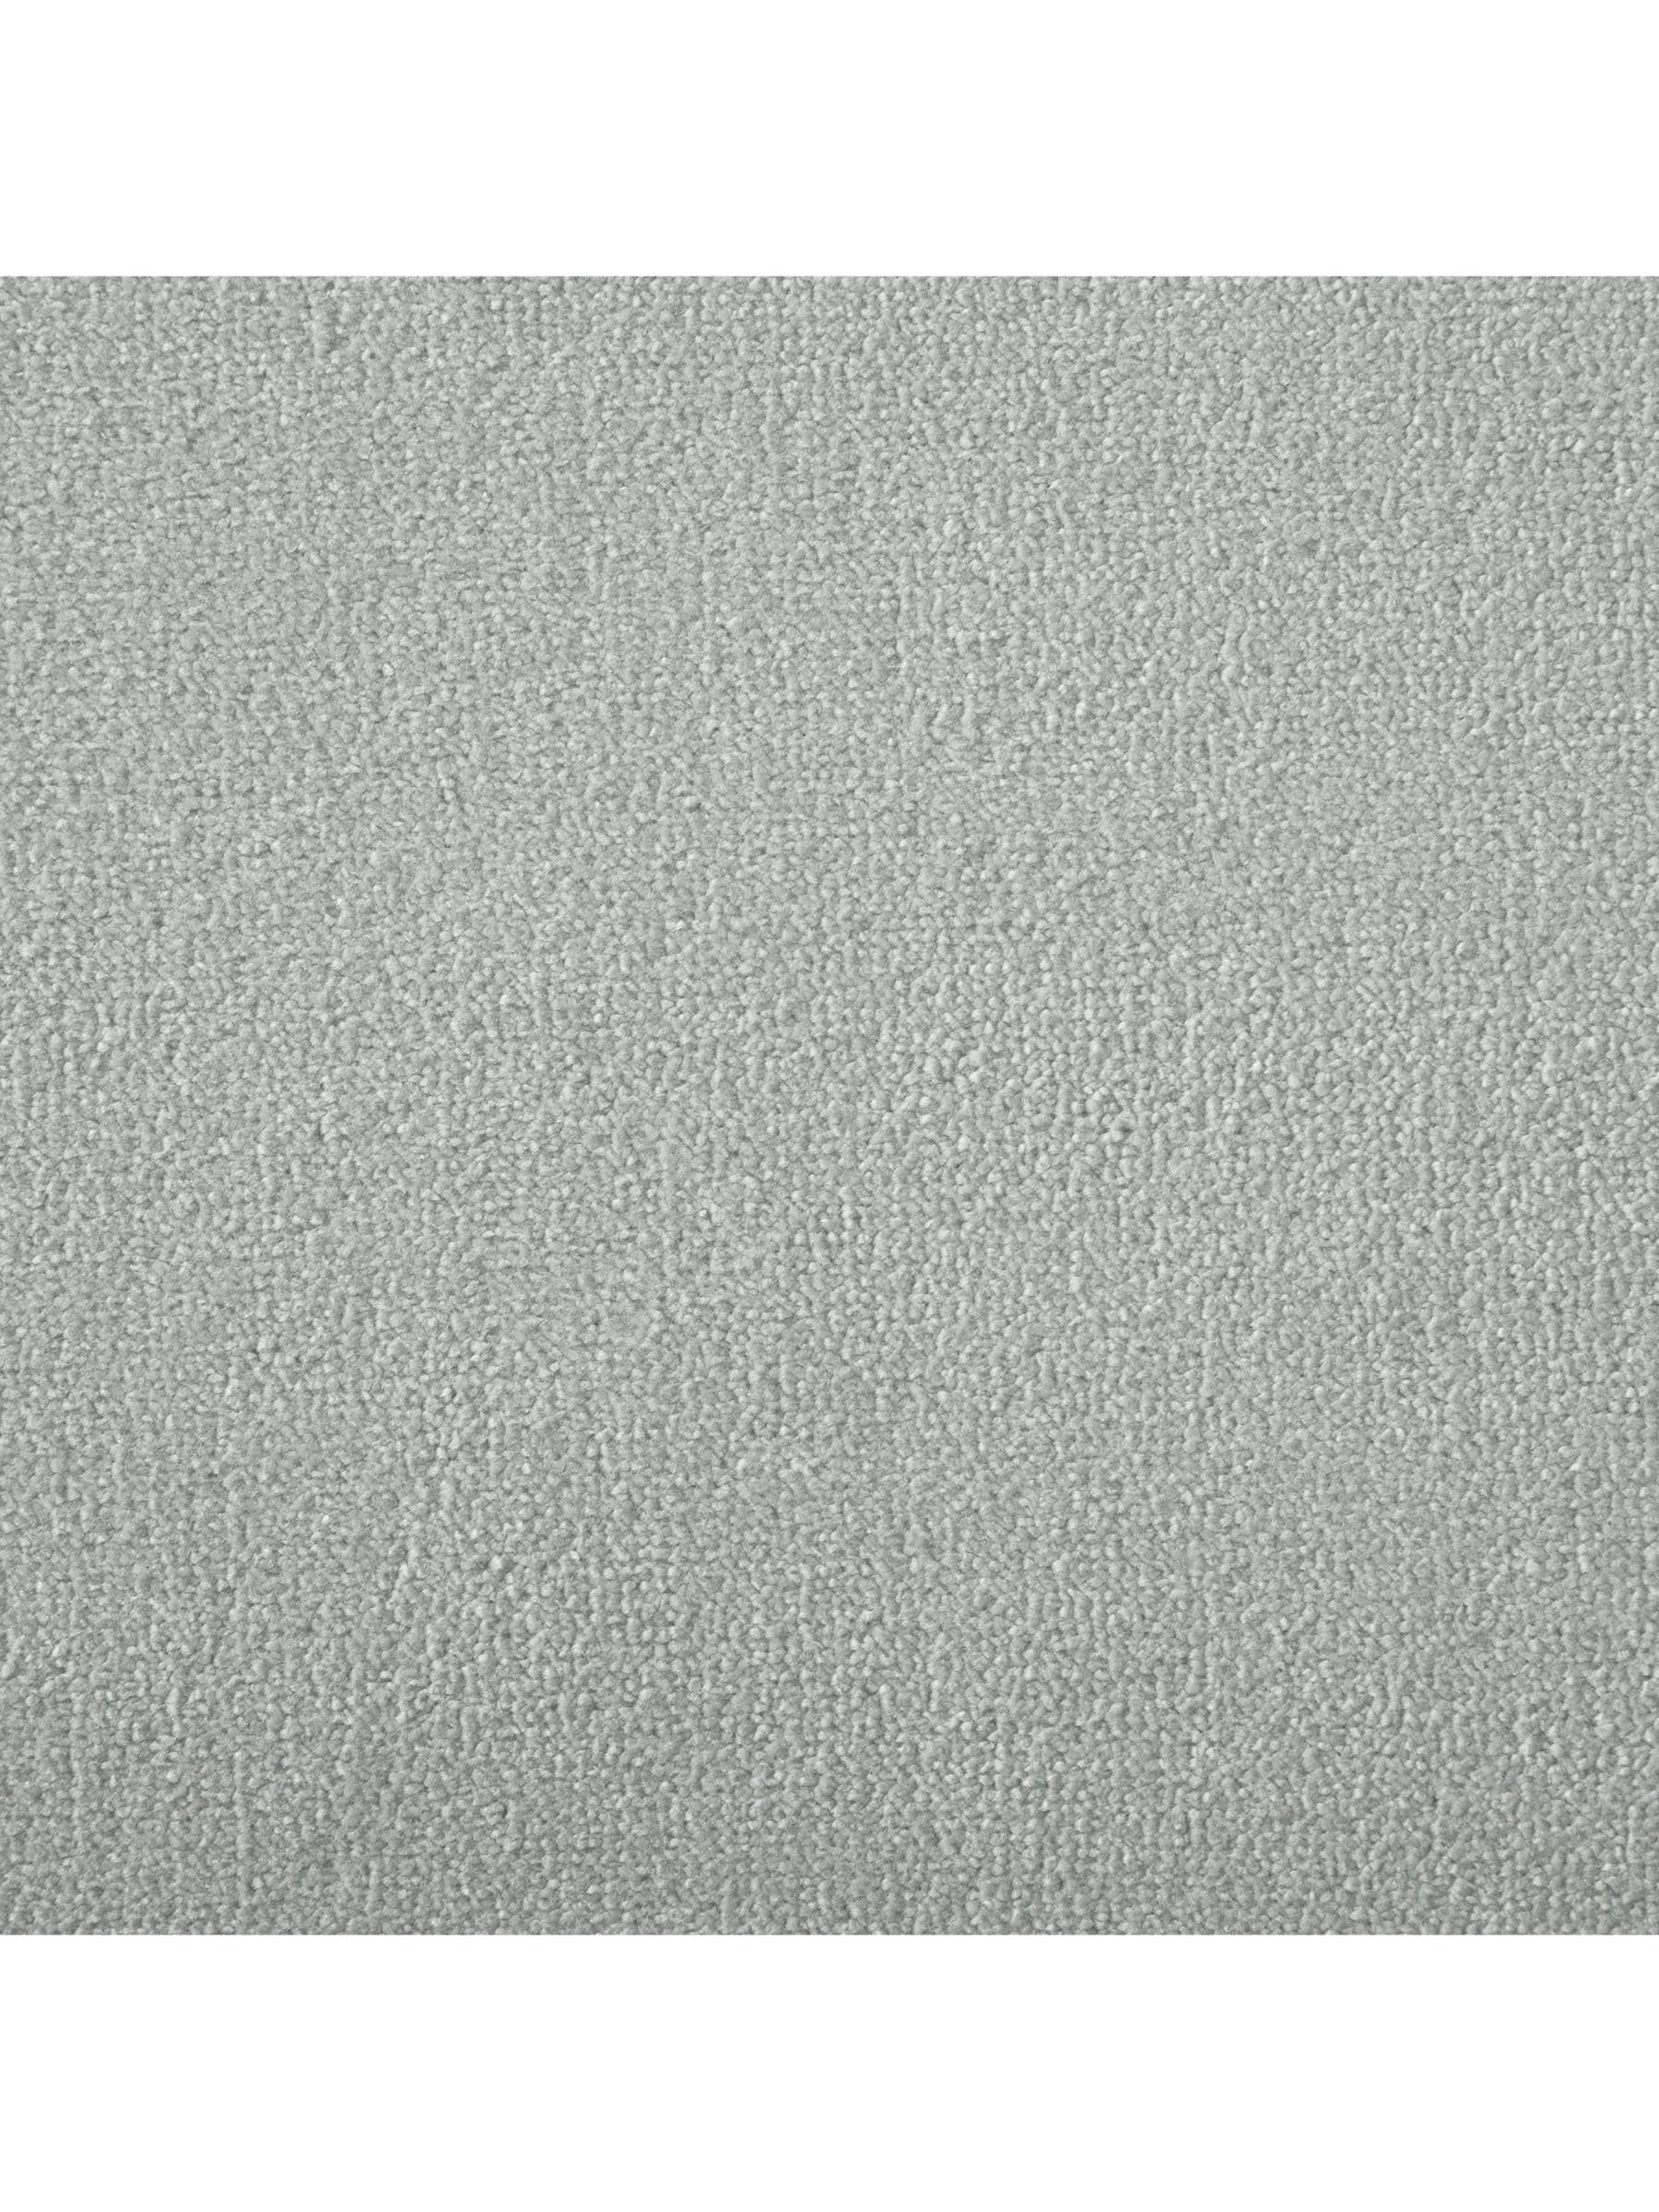 Westex Vogue Silken Velvet Carpet Goldcrest Velvet Carpet Carpet Fitting Carpet